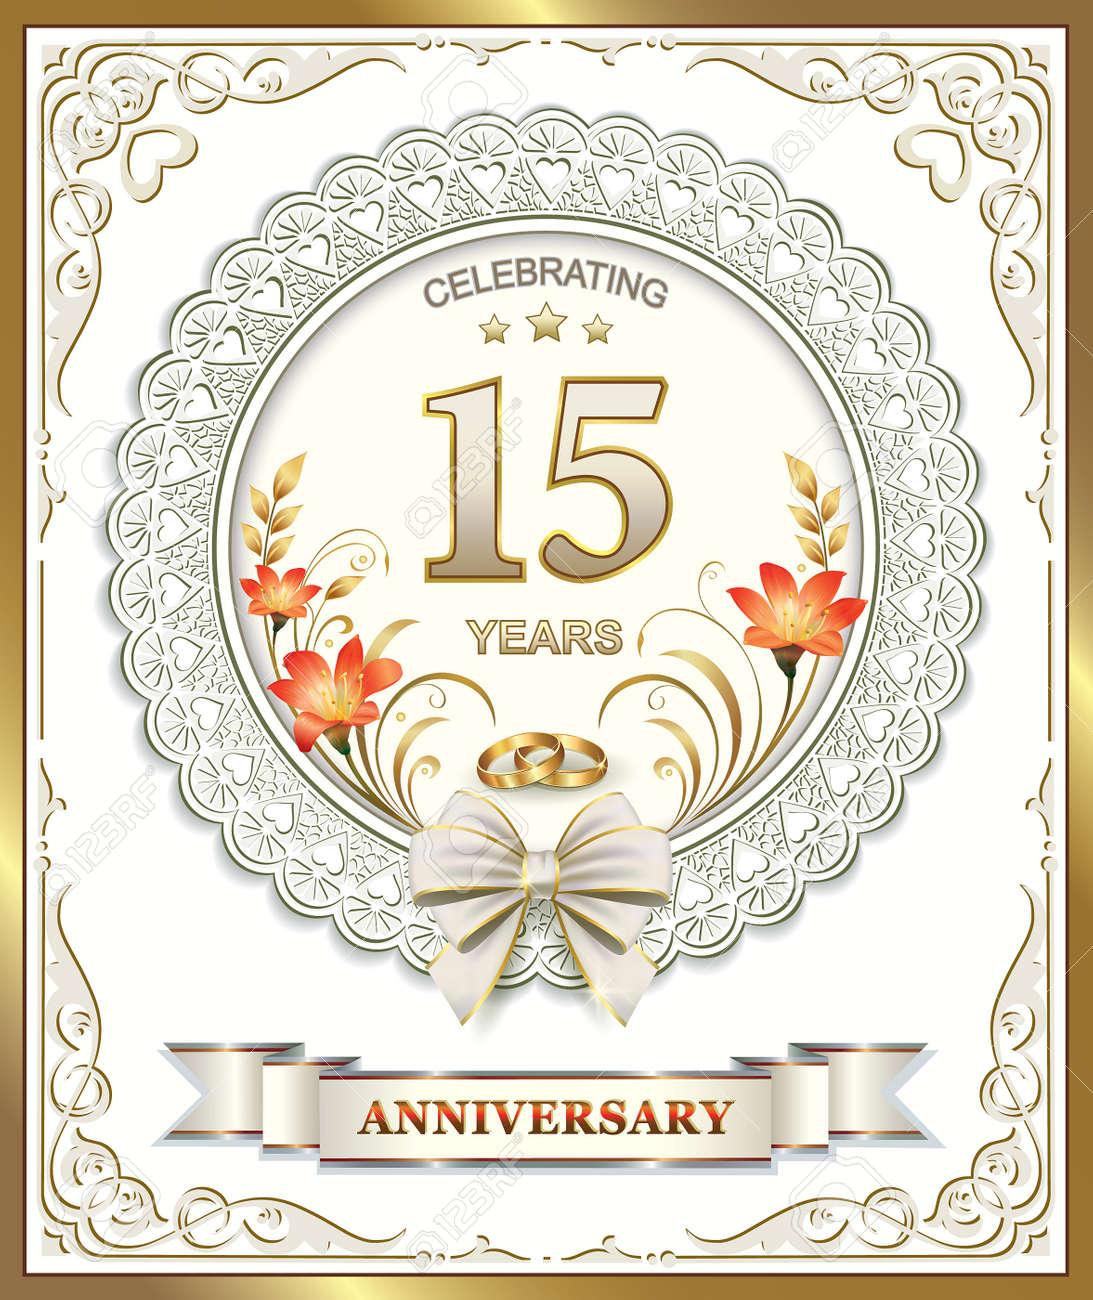 Wedding Anniversary By Year.15 Year Wedding Anniversary In A Beautiful Frame